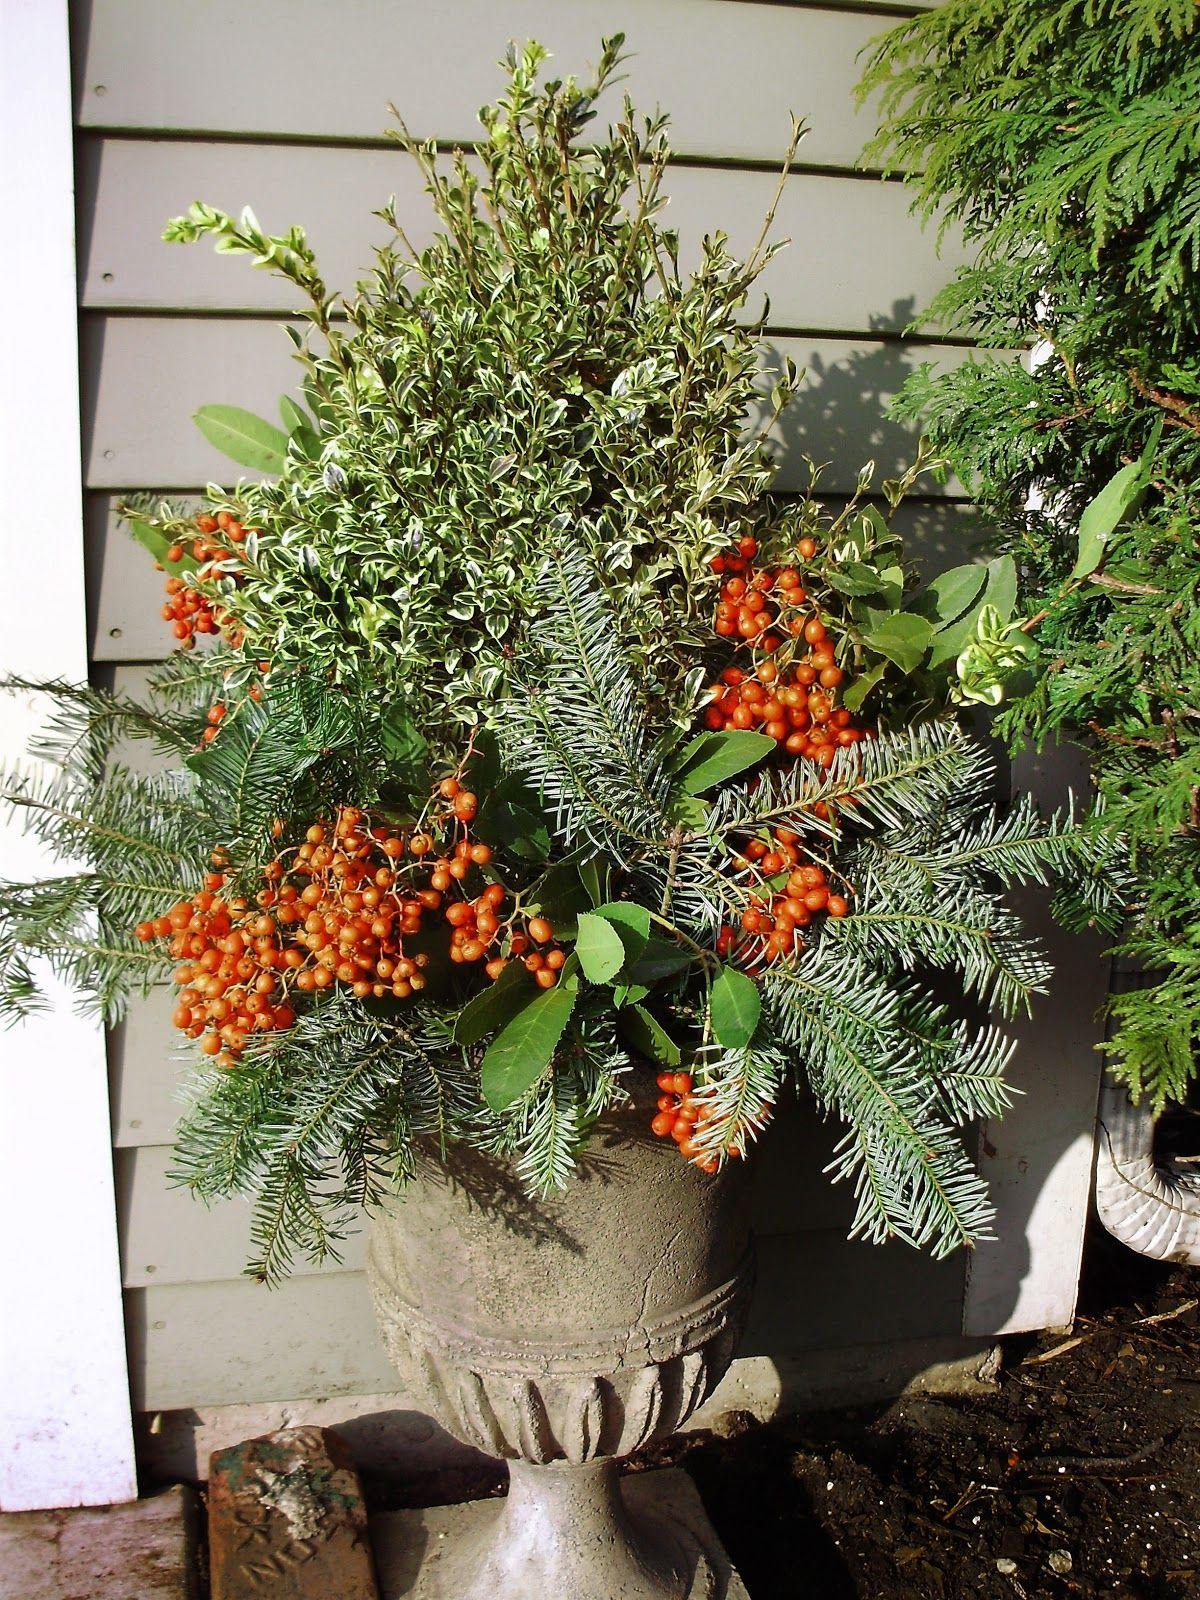 Where To Get The Best Deals On Landscape Supplies | Home & Garden ...